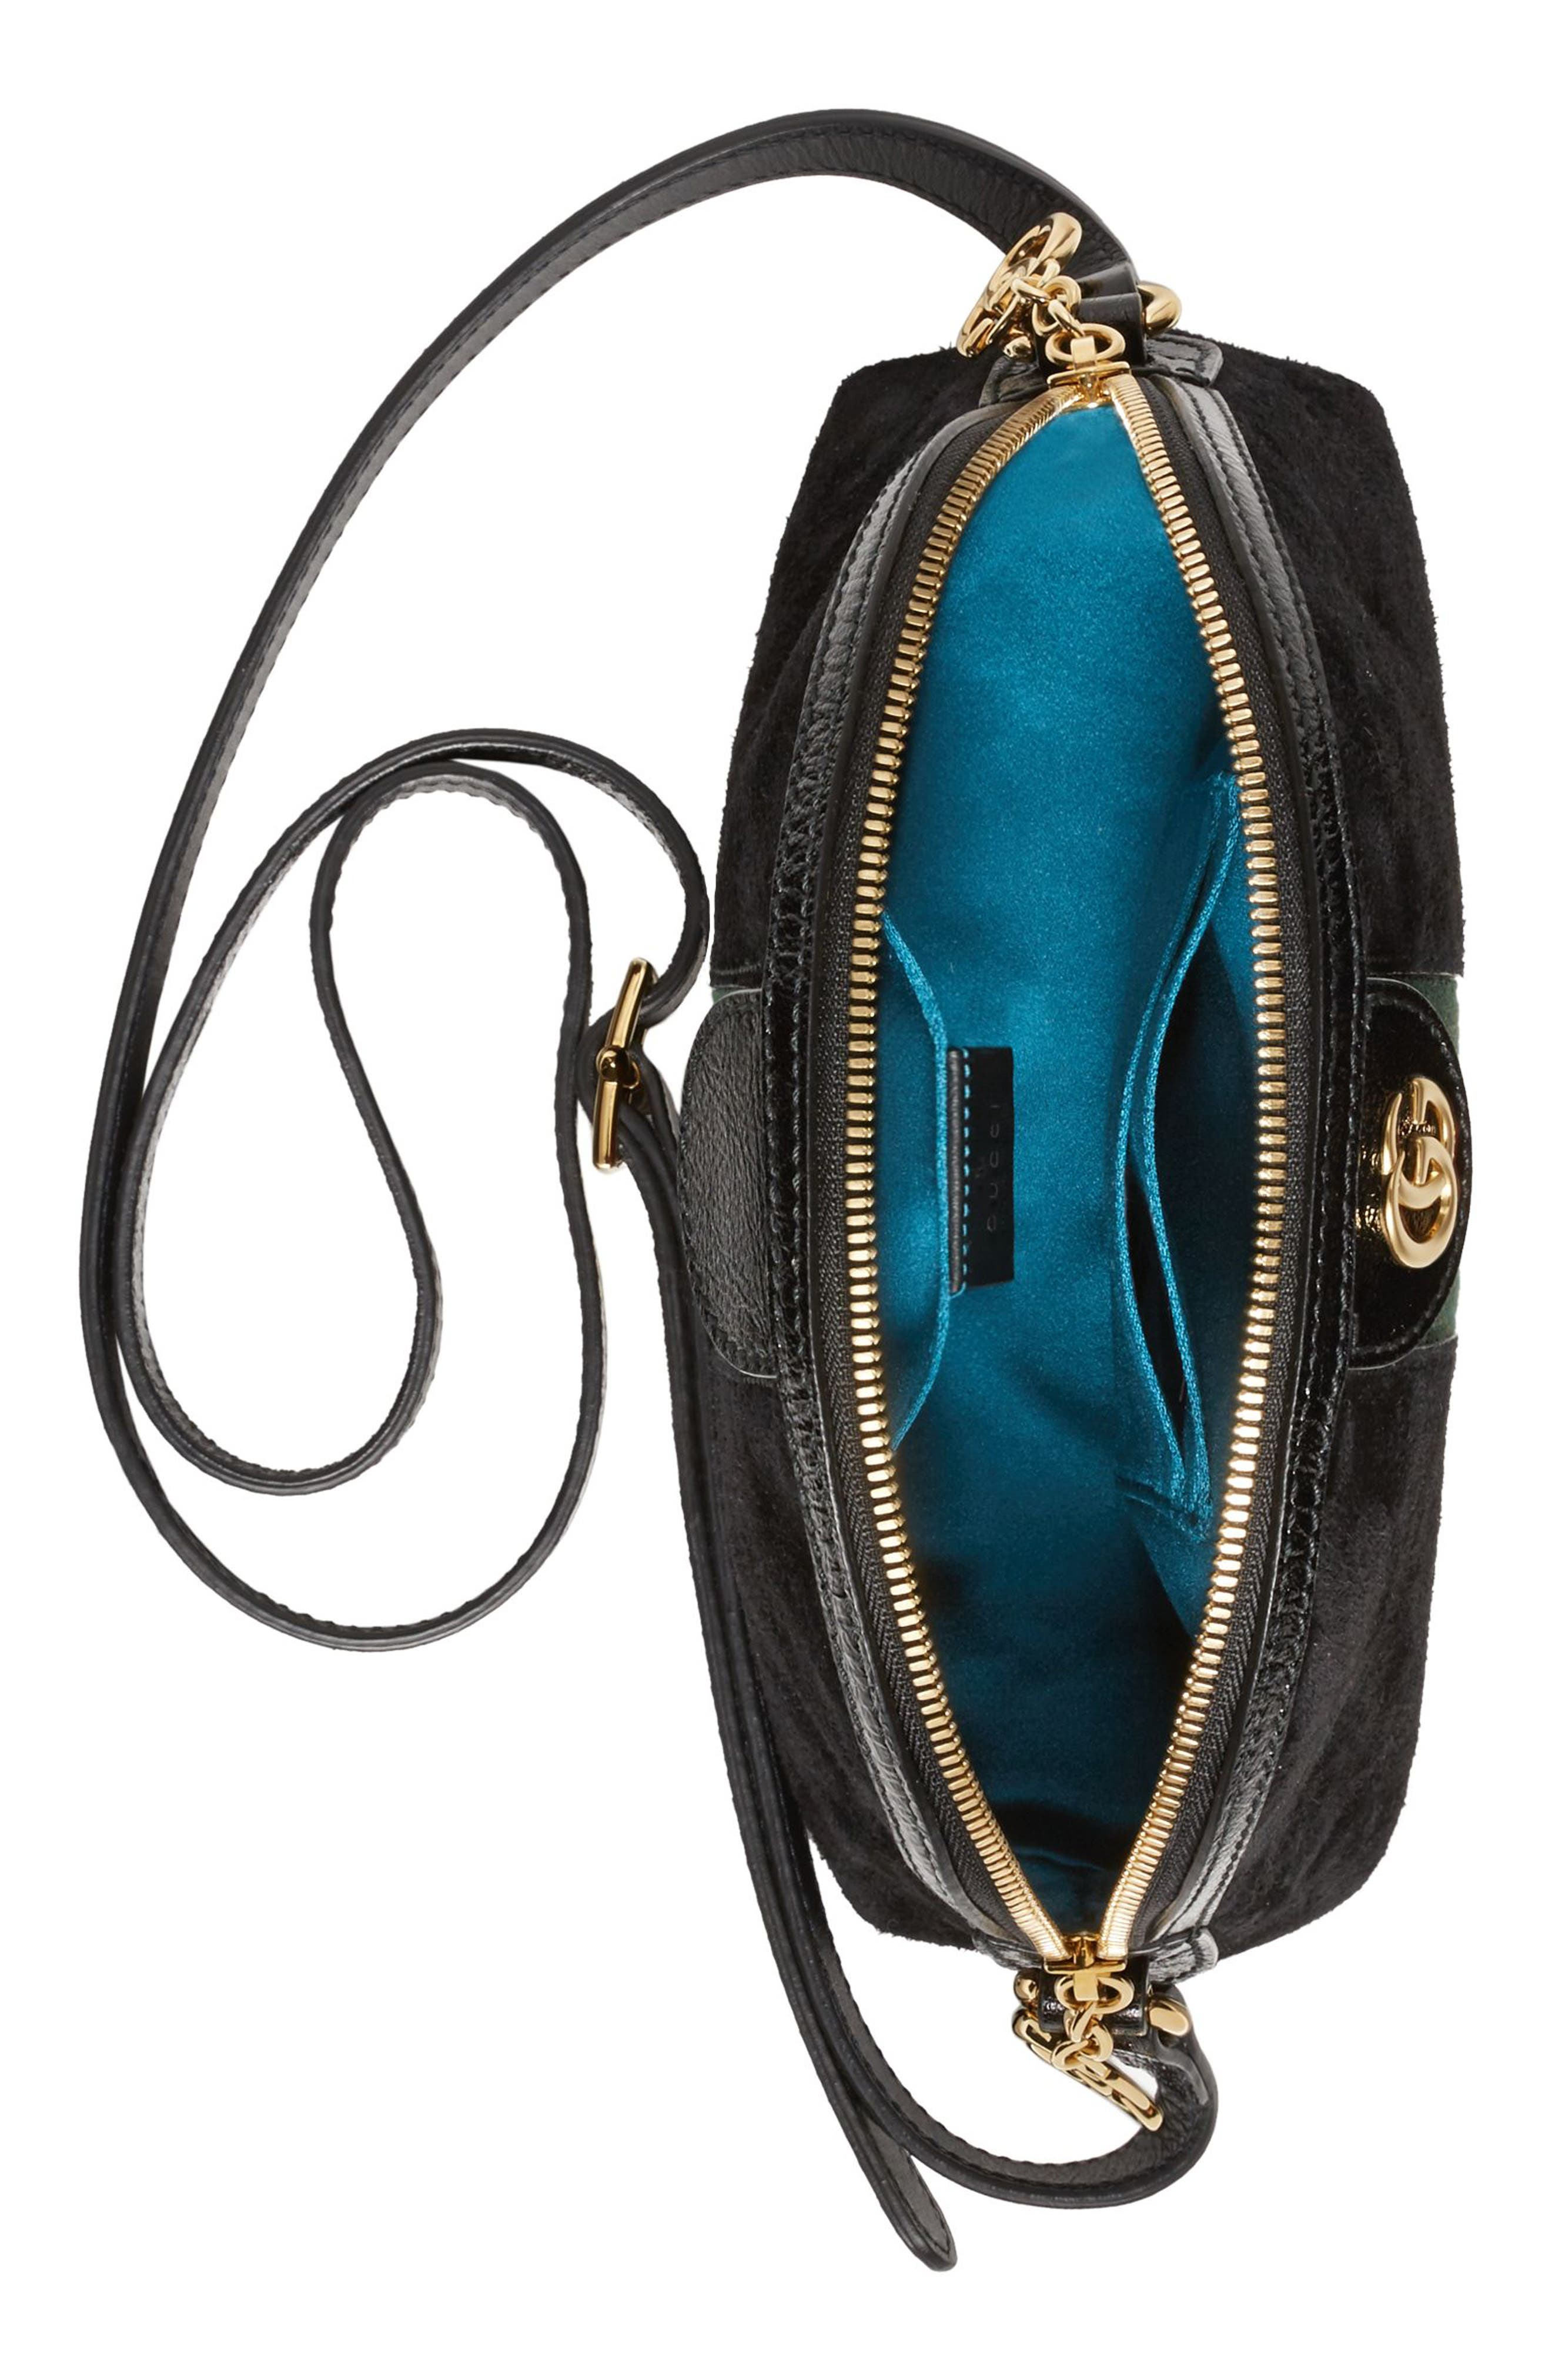 Small Suede Shoulder Bag,                             Alternate thumbnail 3, color,                             NERO/ NERO/ VERT RED VERT